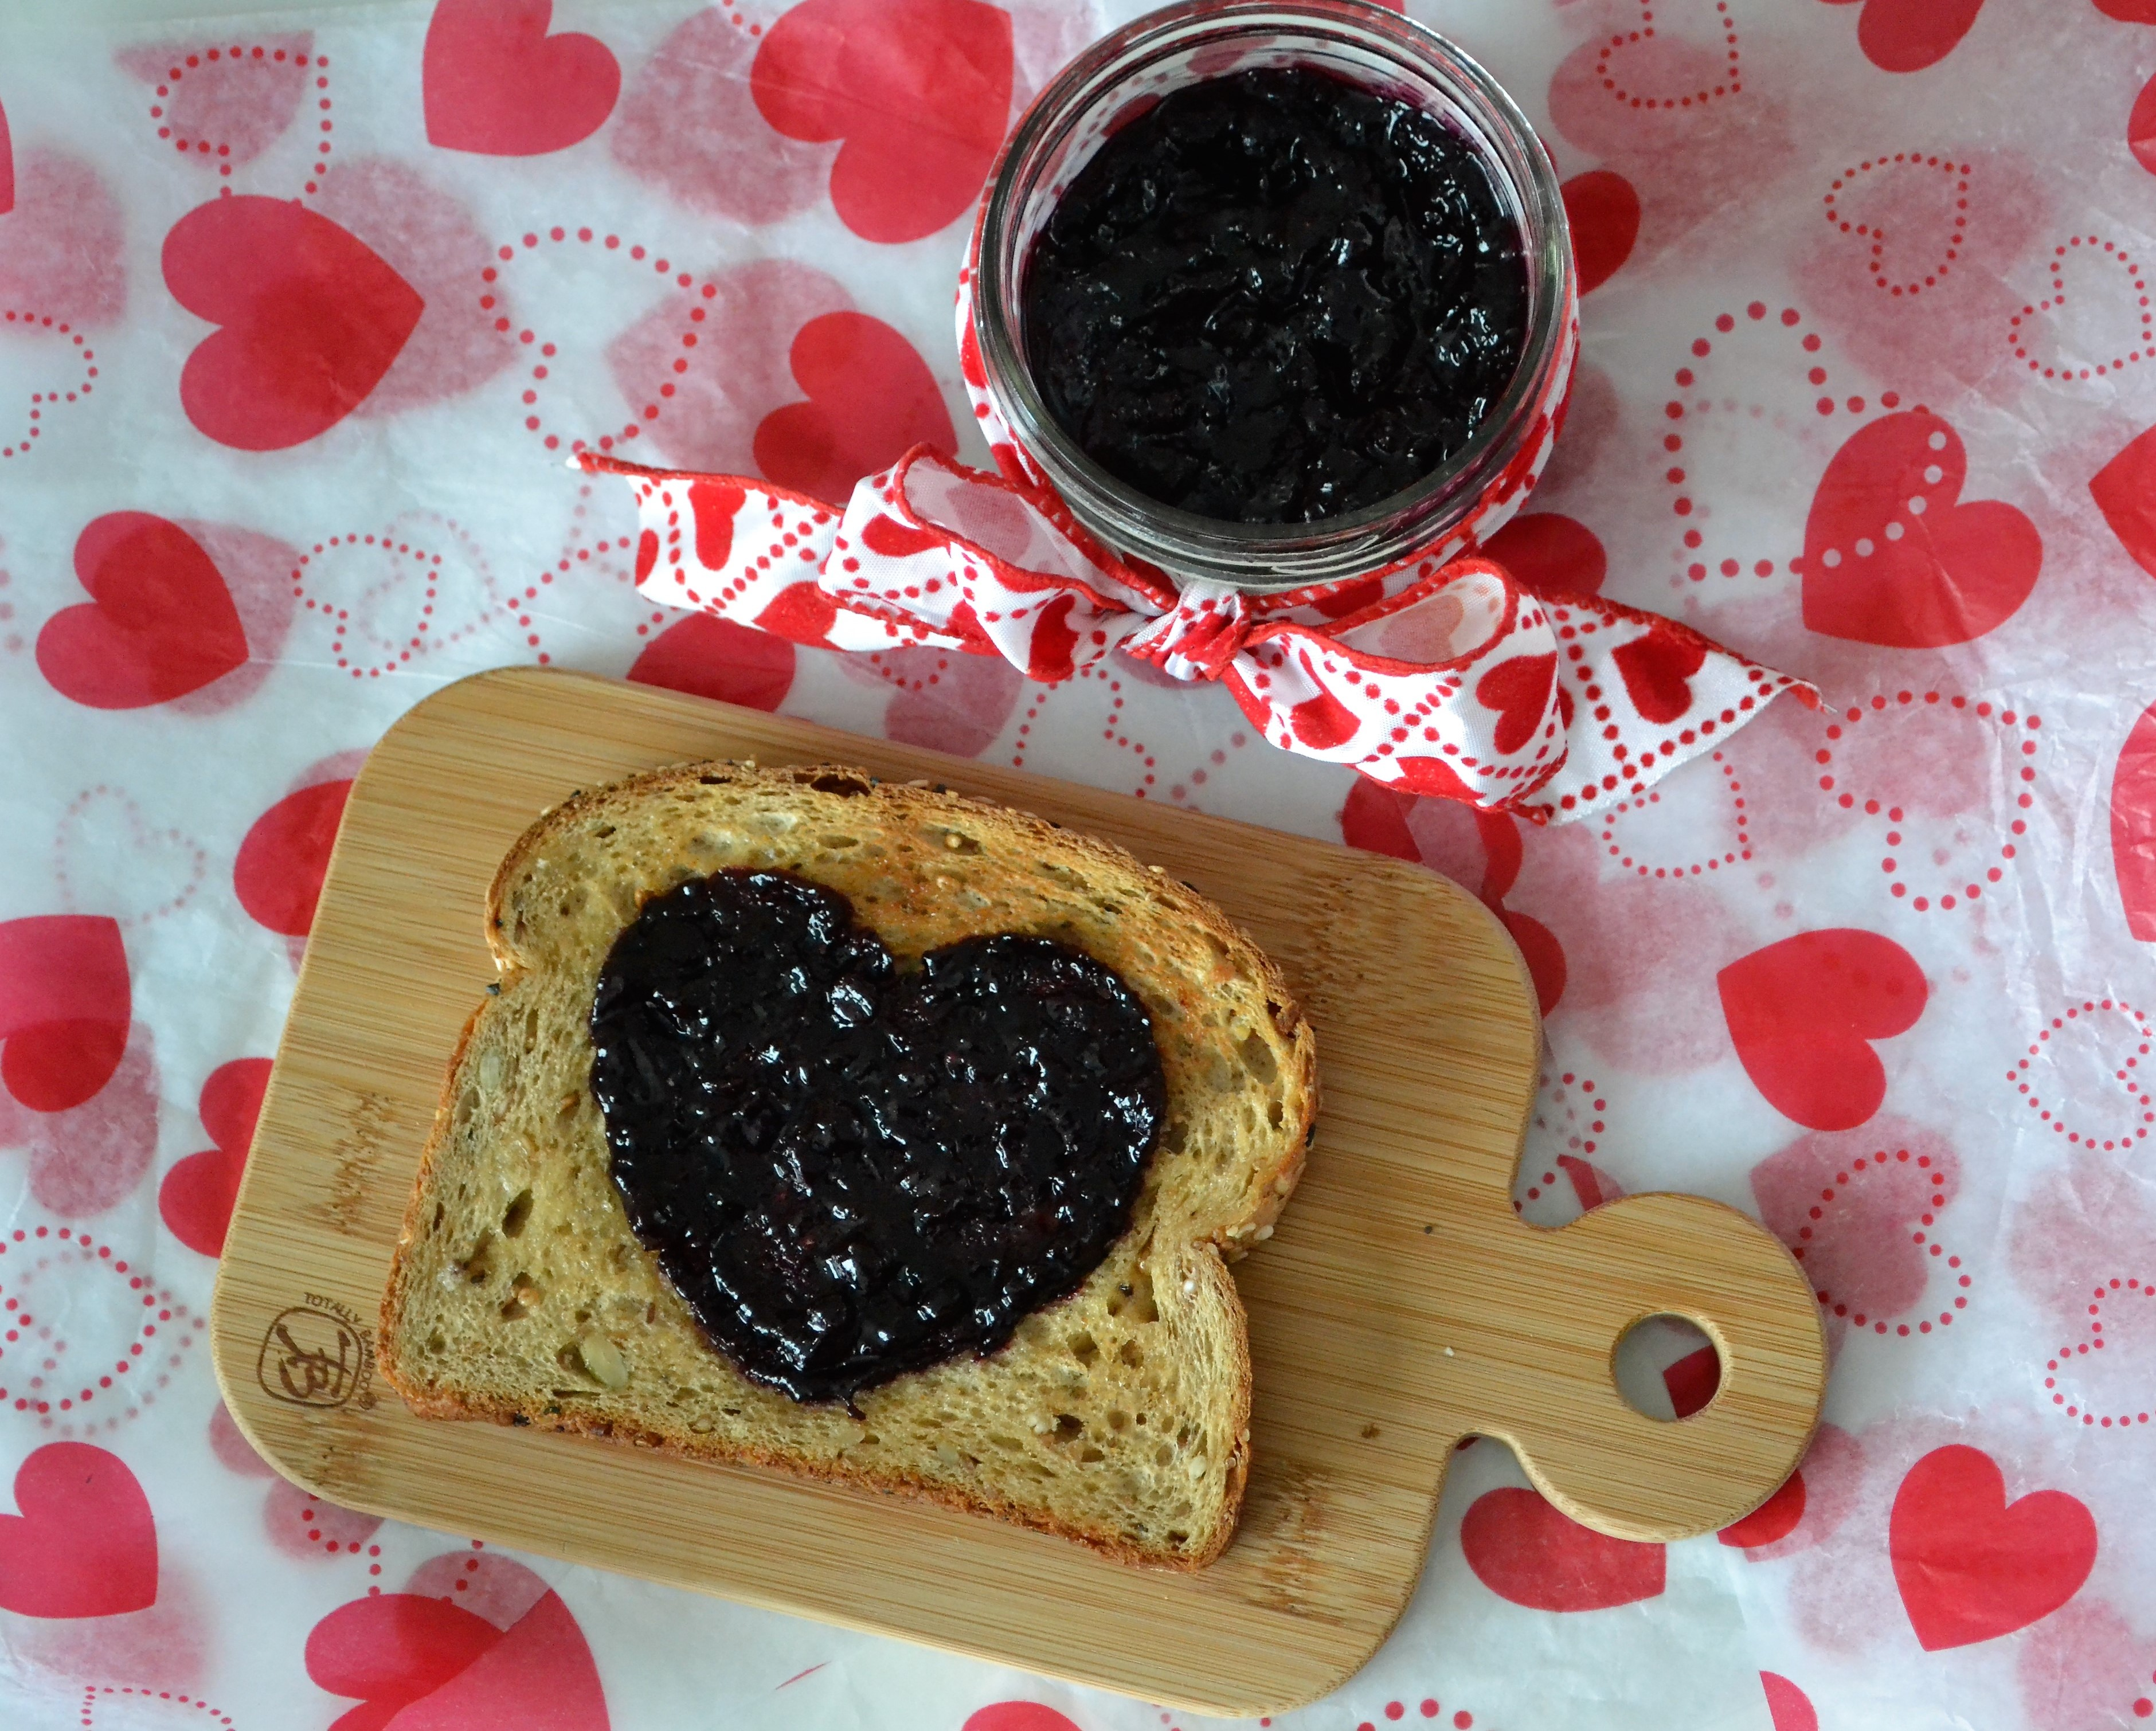 Easy Small-Batch Blueberry Jam